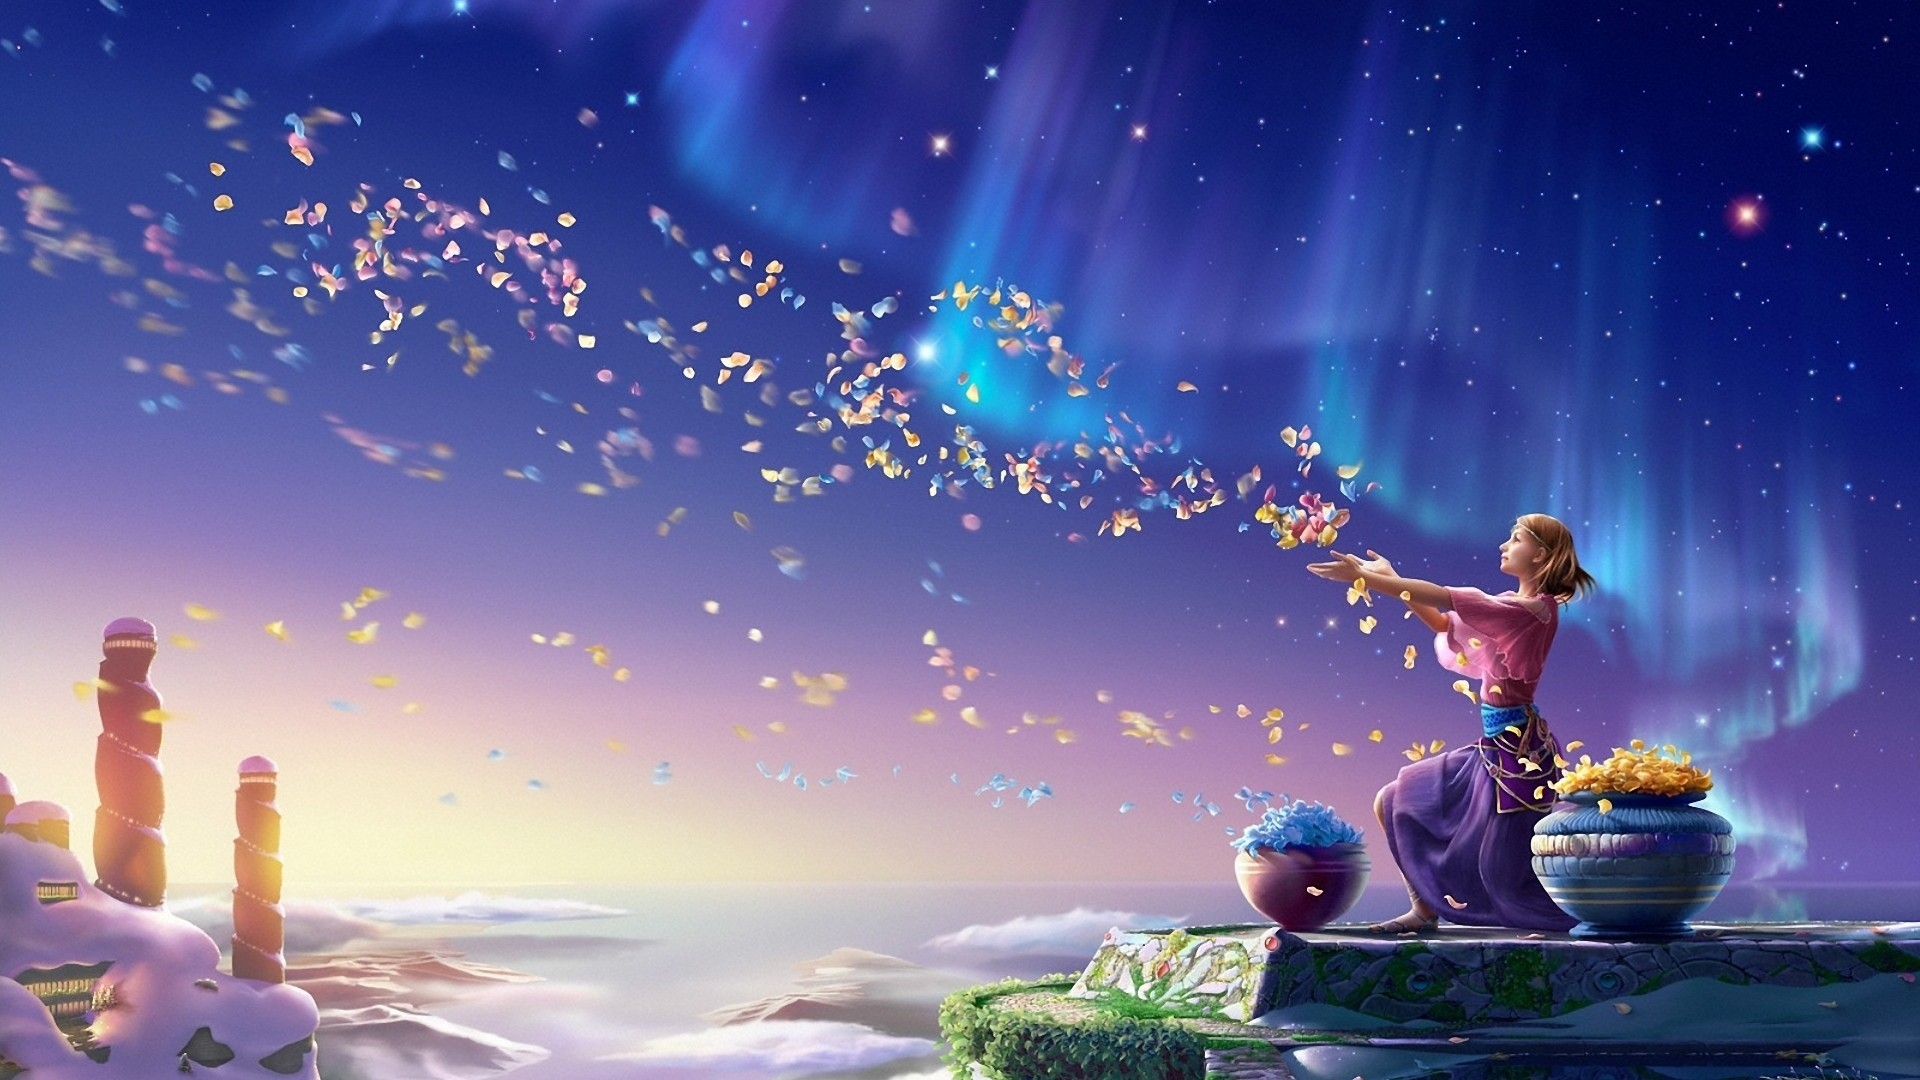 art, kagaya wallpaper, girl, petals, flowers, northern lights, the sky